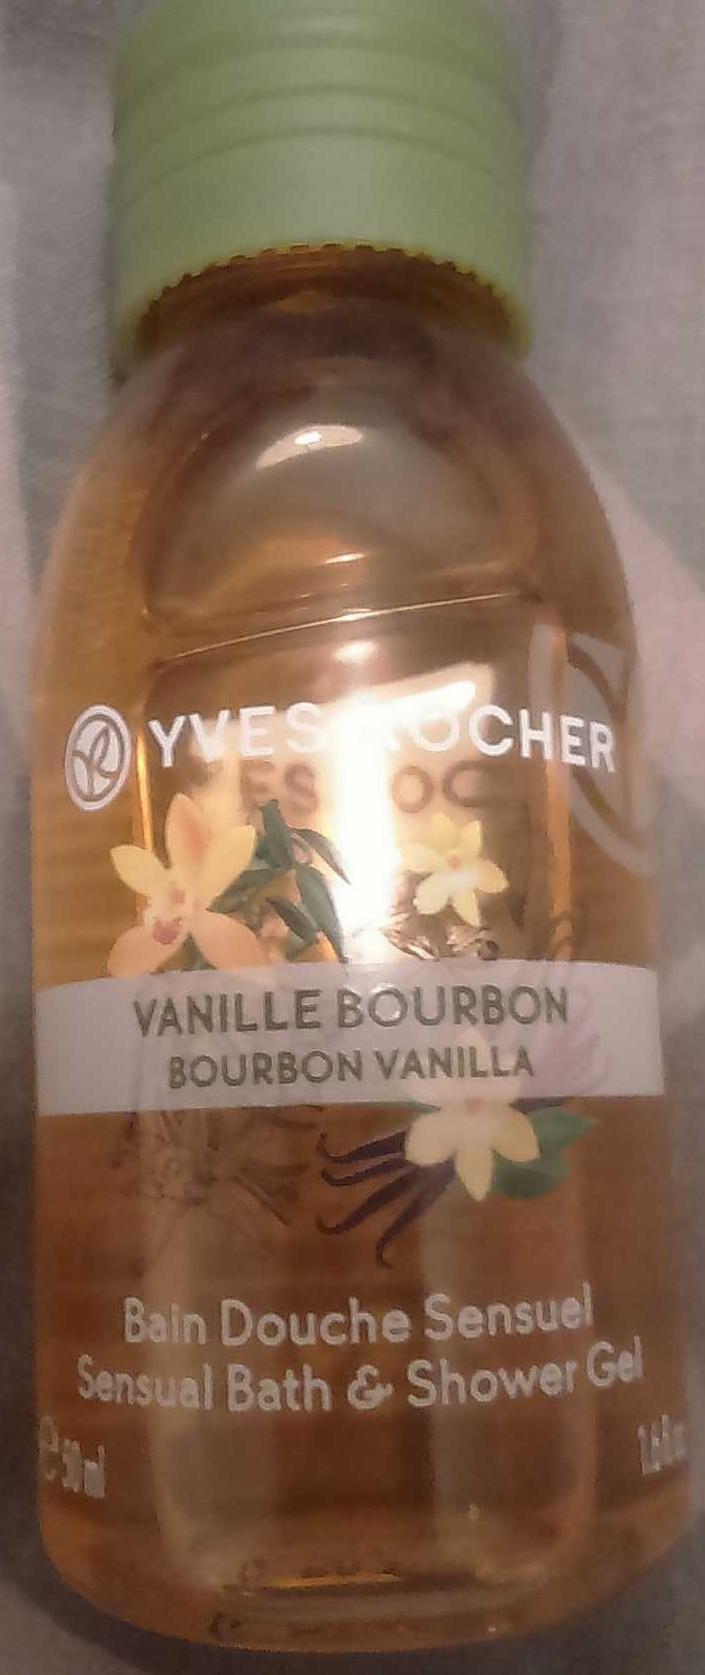 Vanille bourbon - bain douche sensuel - Product